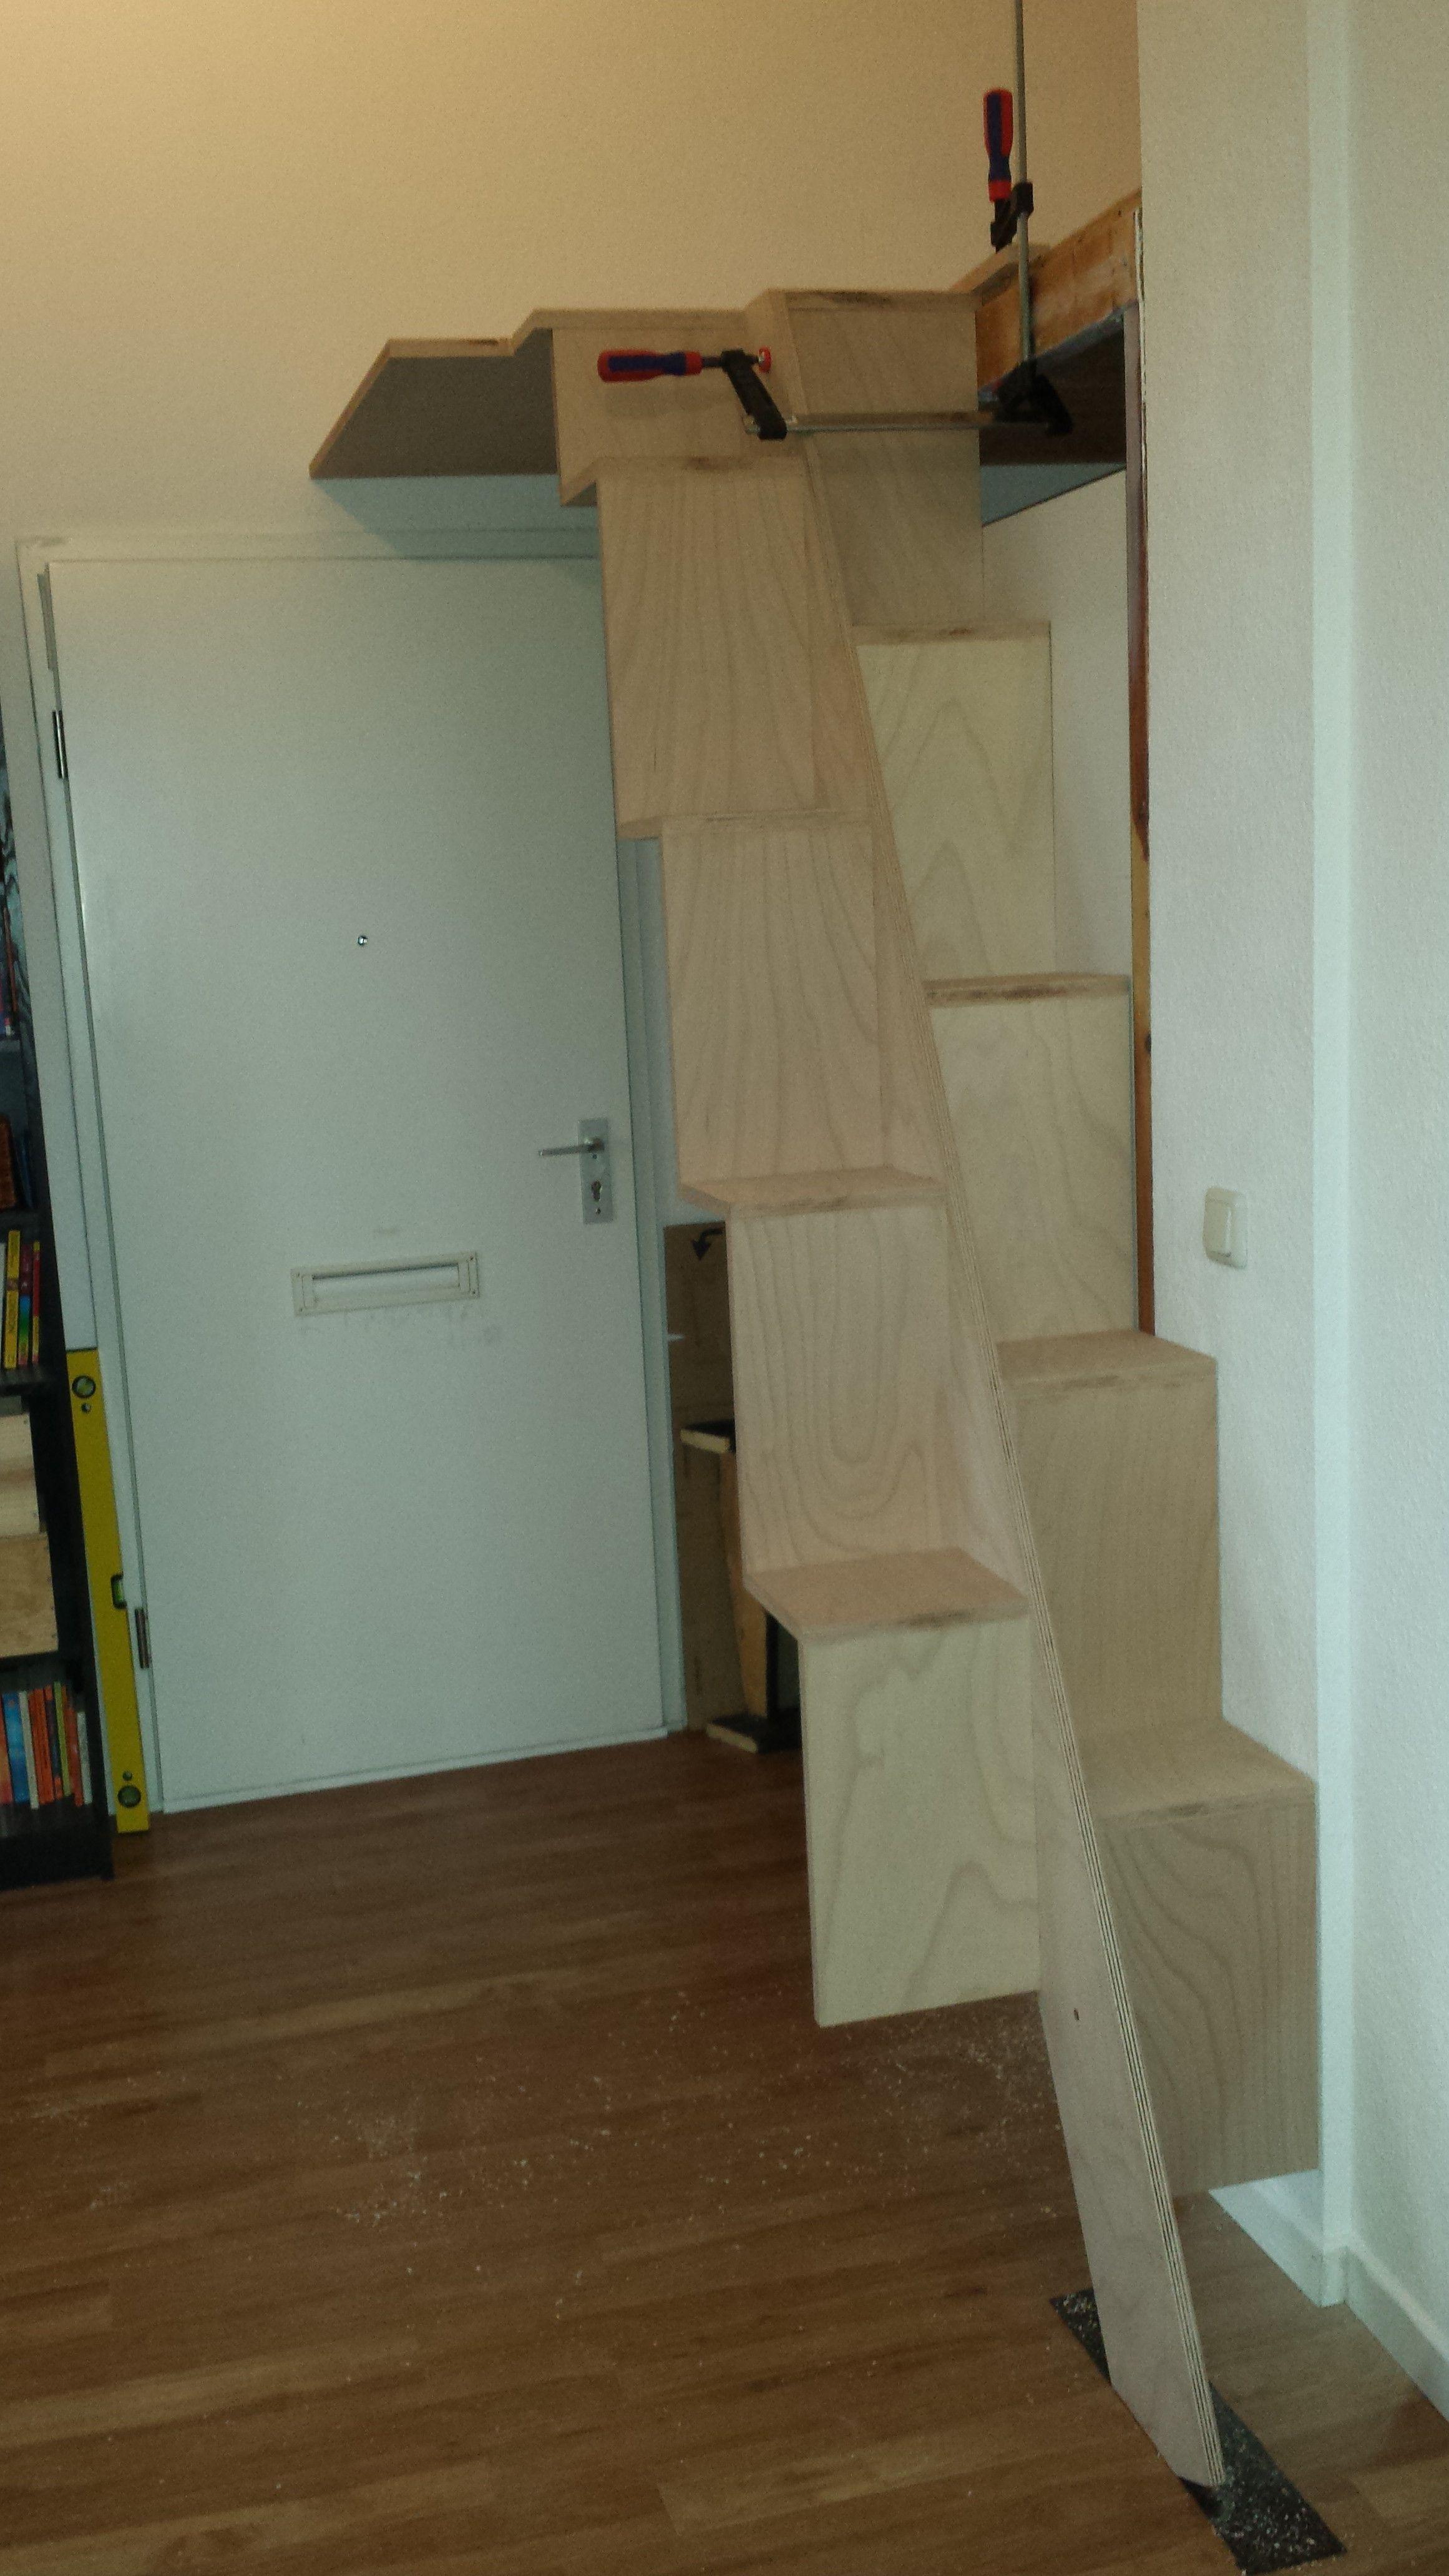 samba treppe auf zum neuem hochbett aaa pinterest treppe hochbett und bett. Black Bedroom Furniture Sets. Home Design Ideas